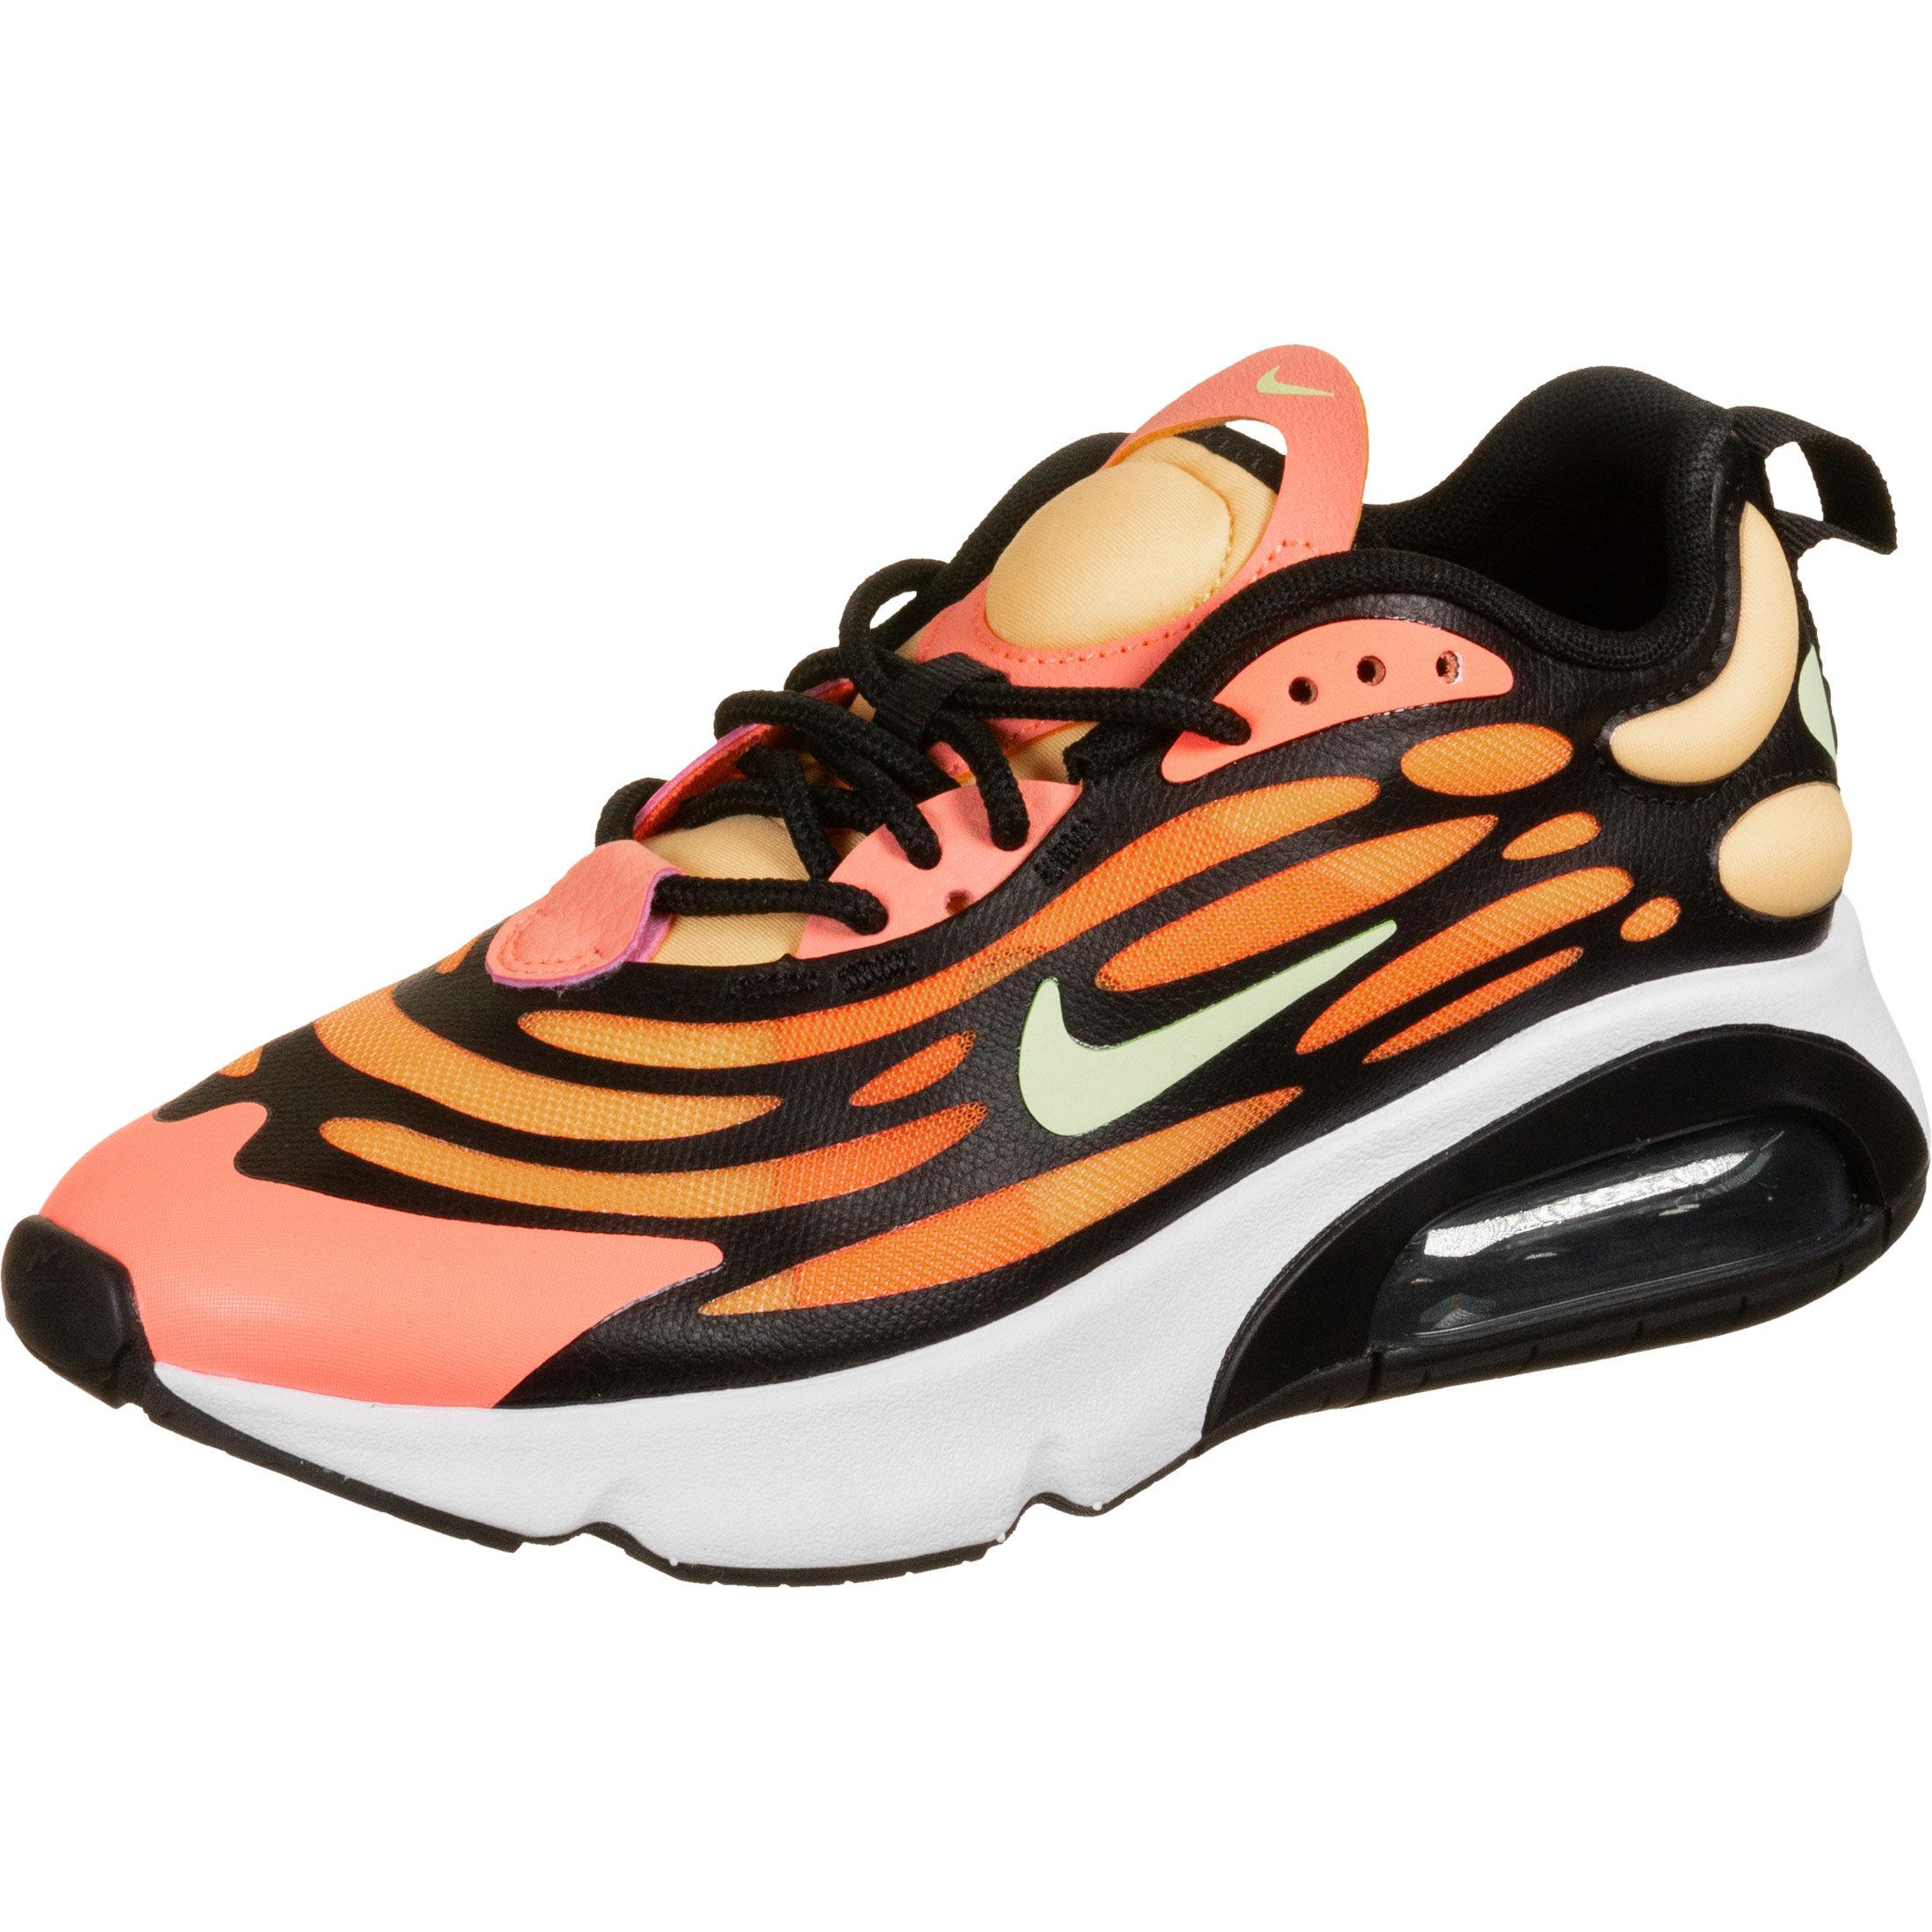 Nike Air Max Exosense - Sneakers Low at Stylefile